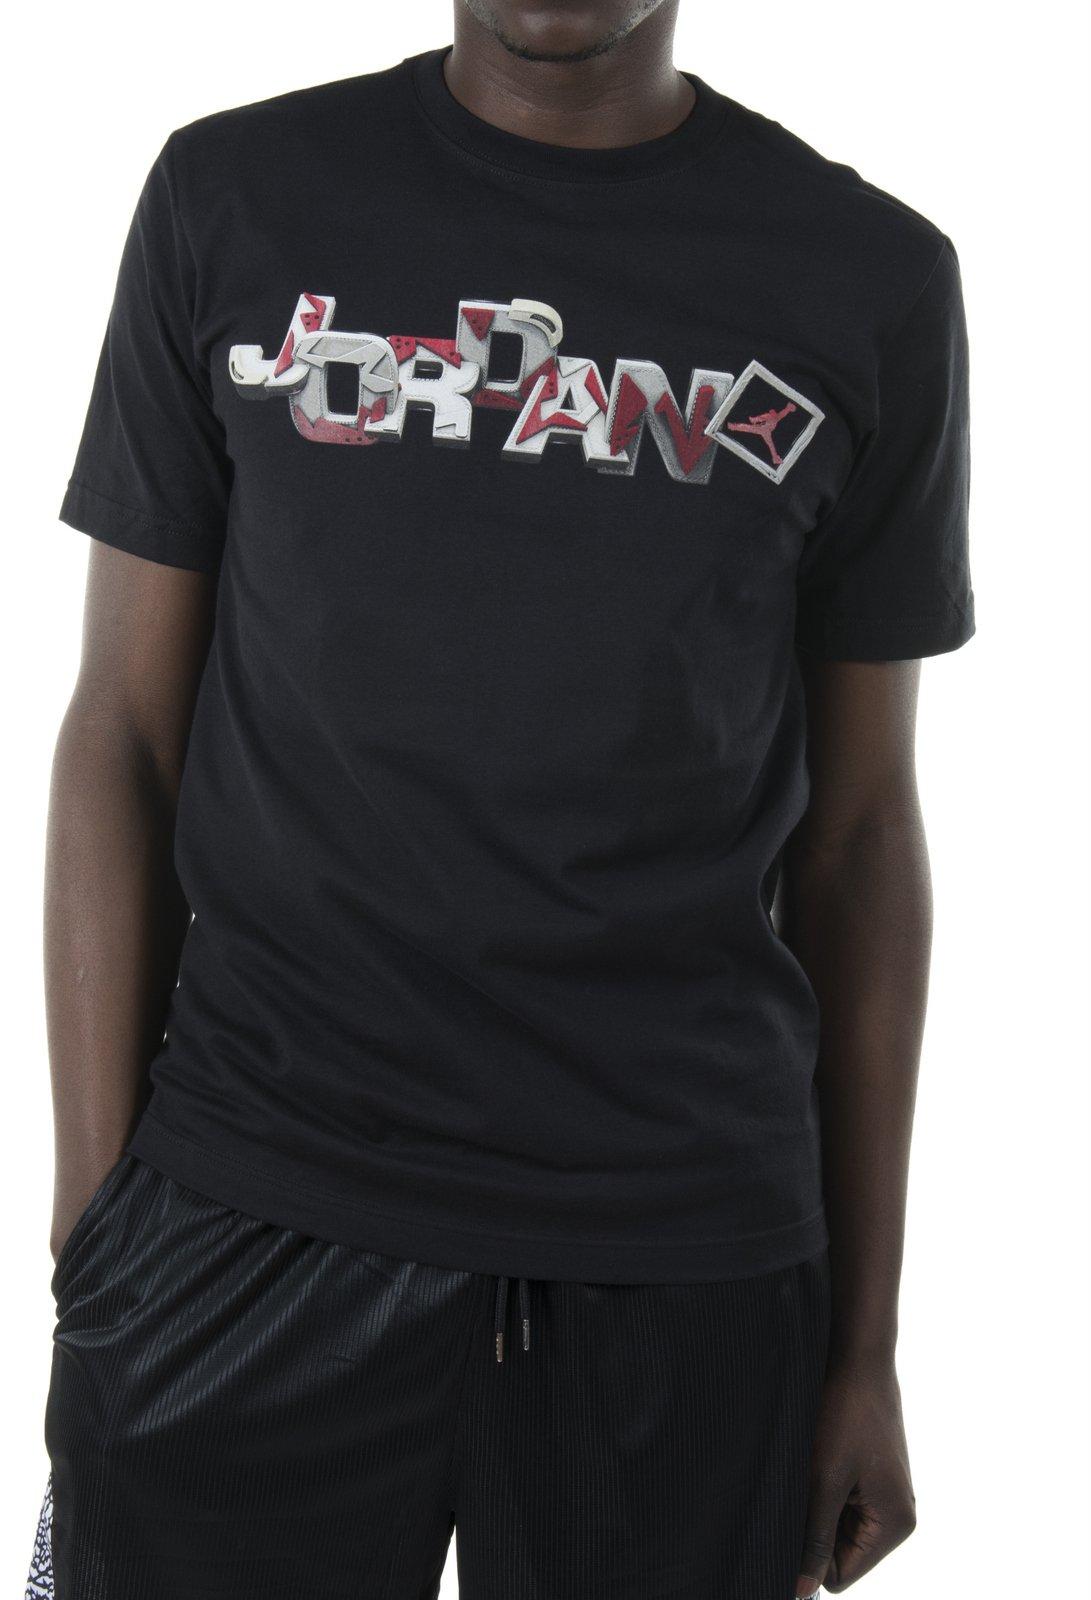 Nike Air Jordan AJVI Go 23 Remix 613024 - Camiseta para hombre, talla M, color negro: Amazon.es: Deportes y aire libre